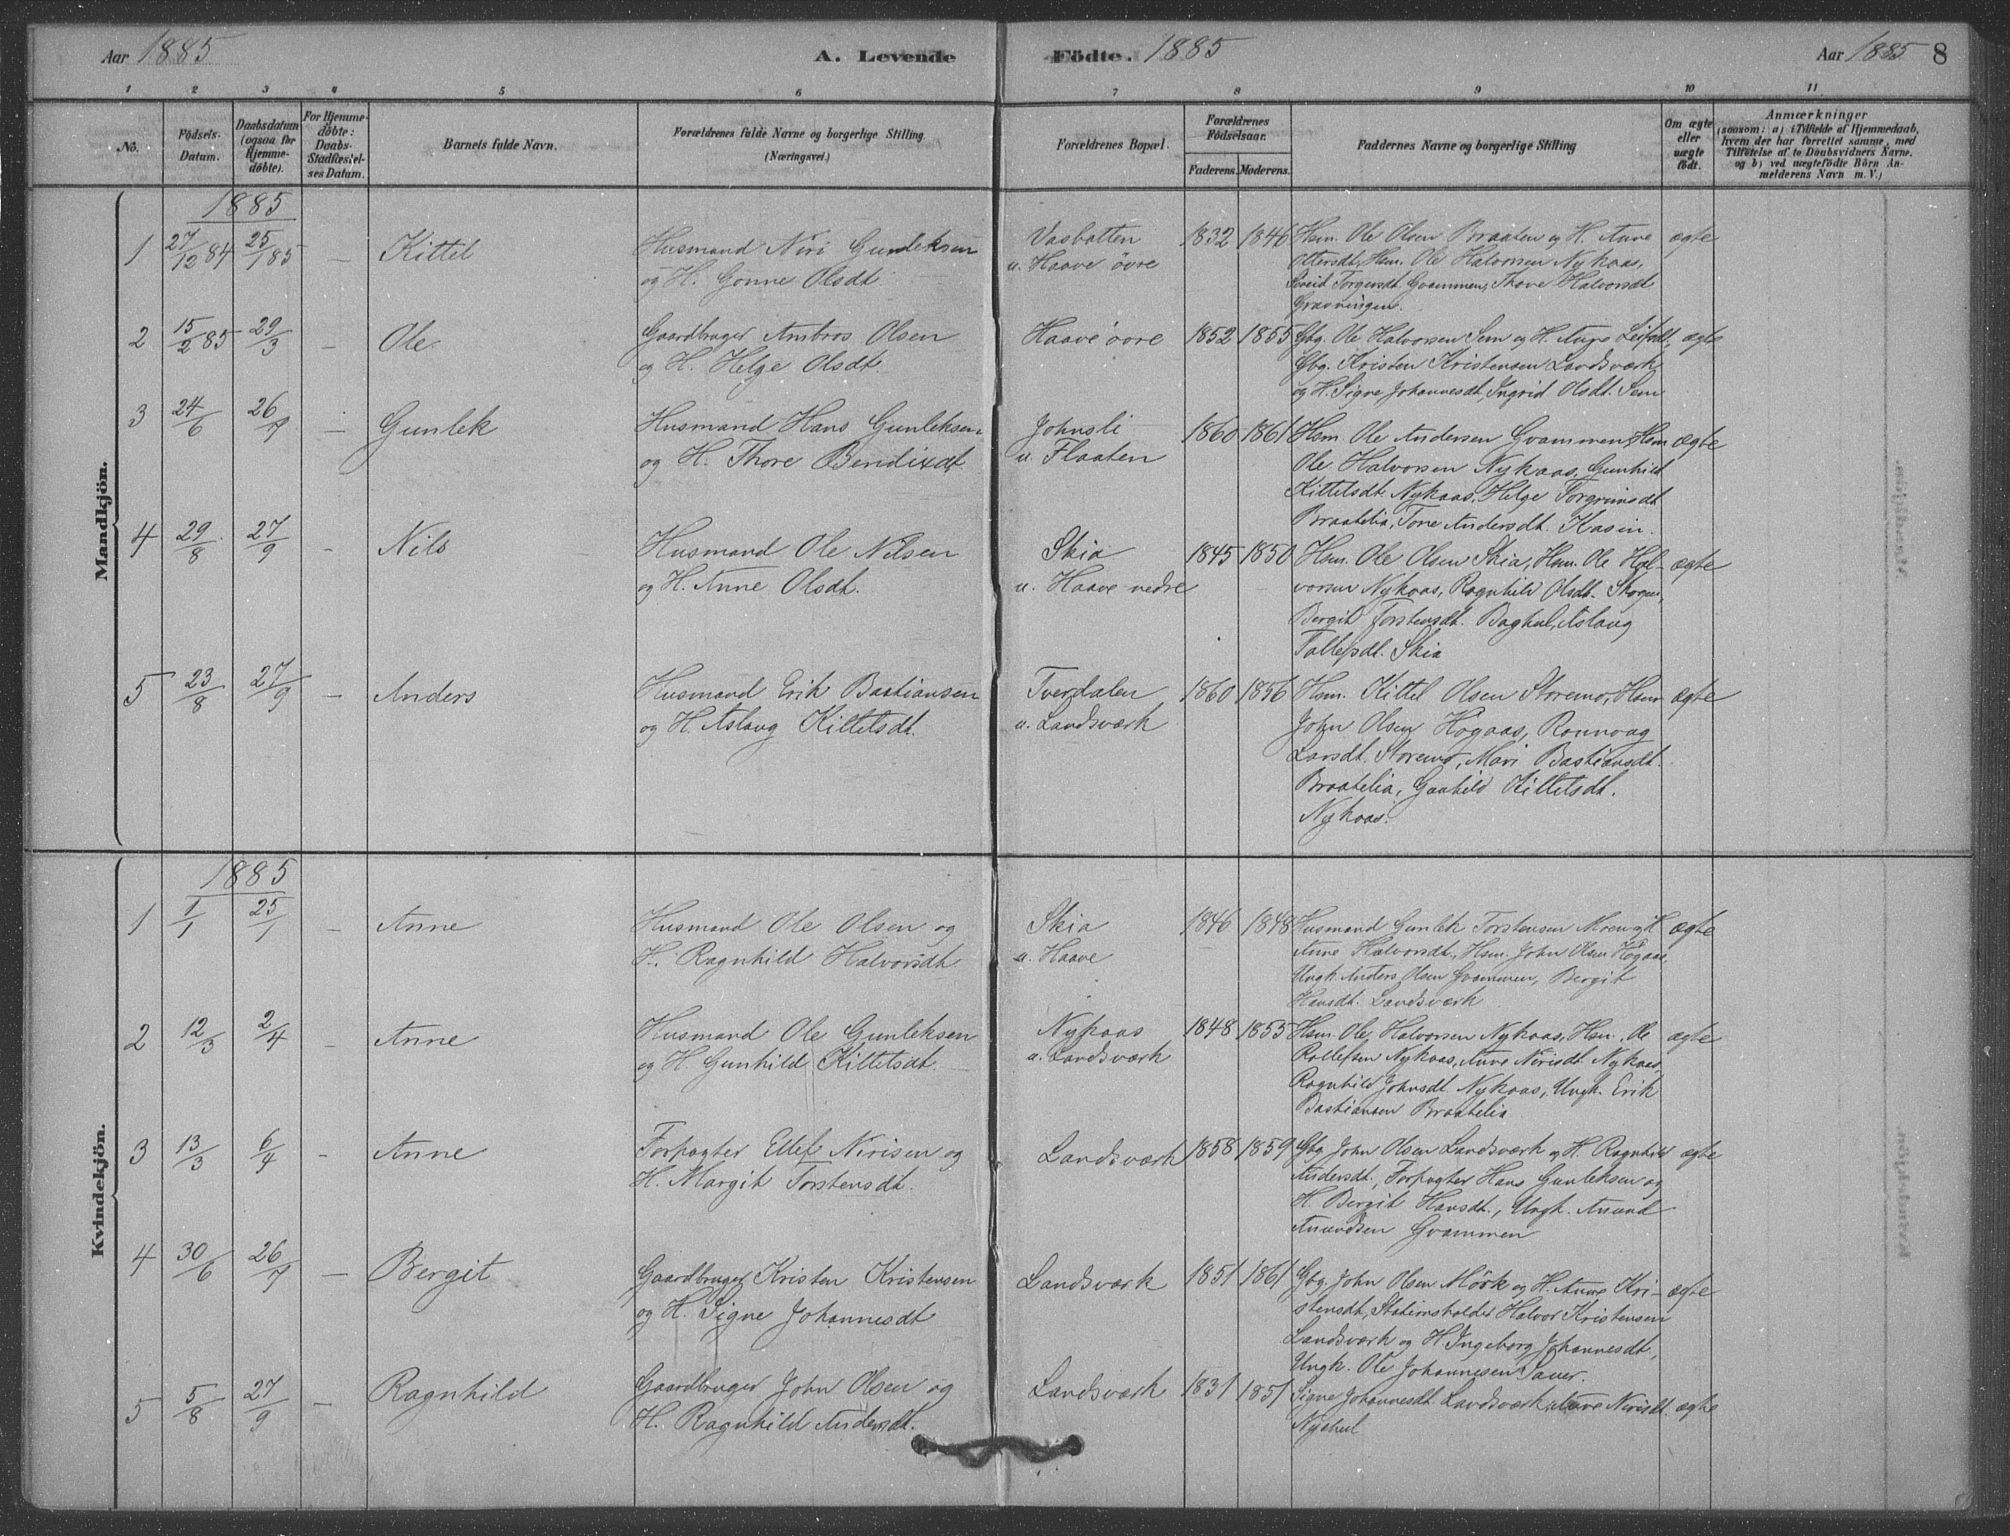 SAKO, Heddal kirkebøker, F/Fb/L0002: Ministerialbok nr. II 2, 1878-1913, s. 8